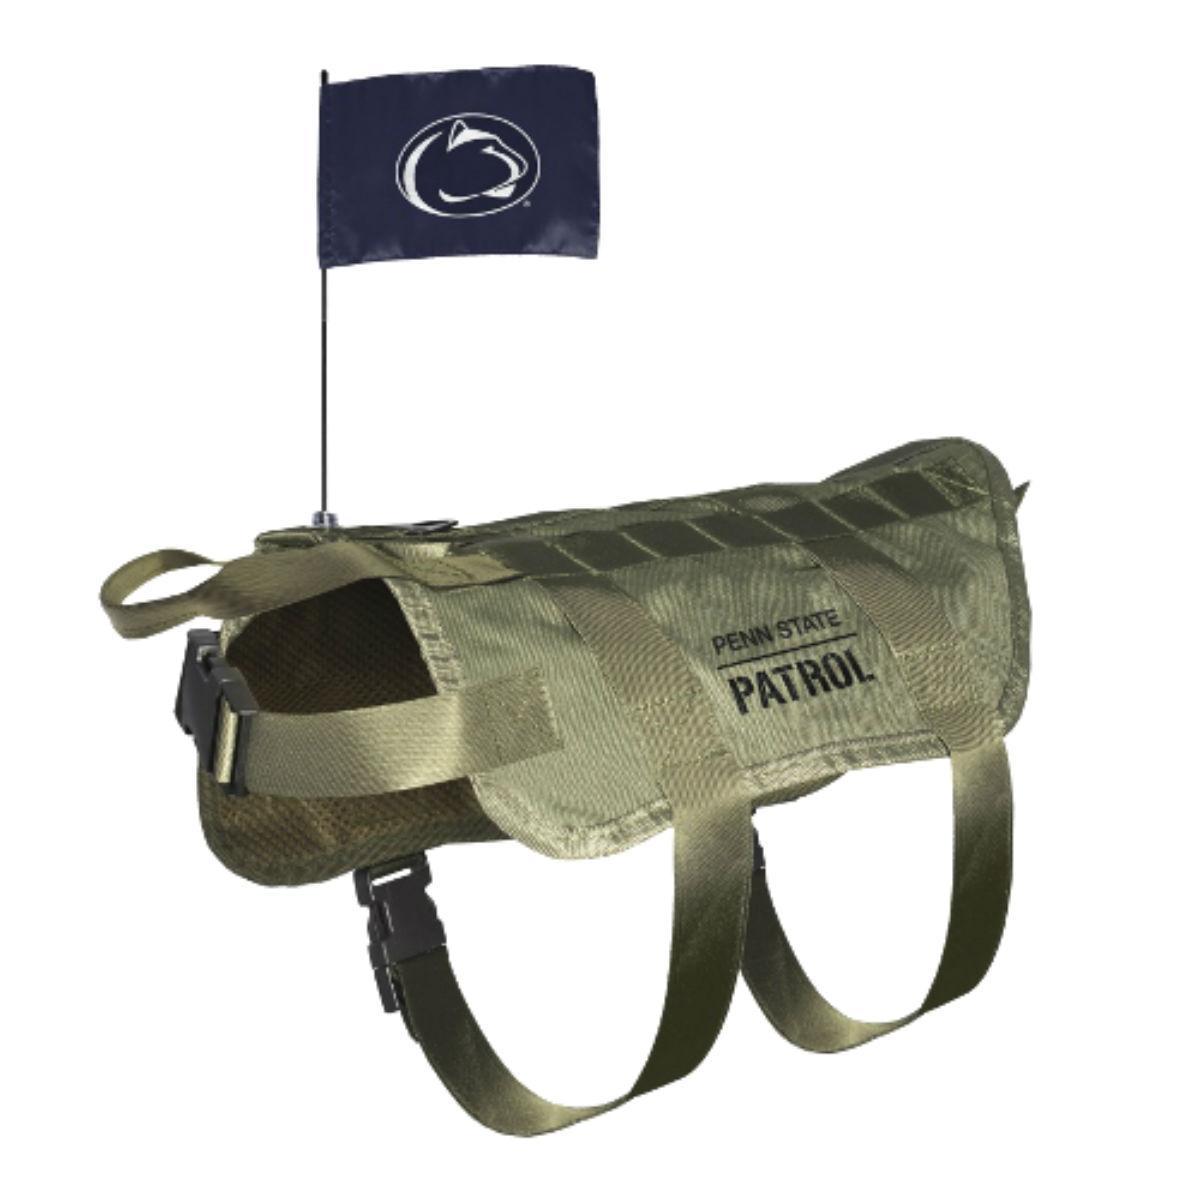 Penn State Tactical Vest Dog Harness